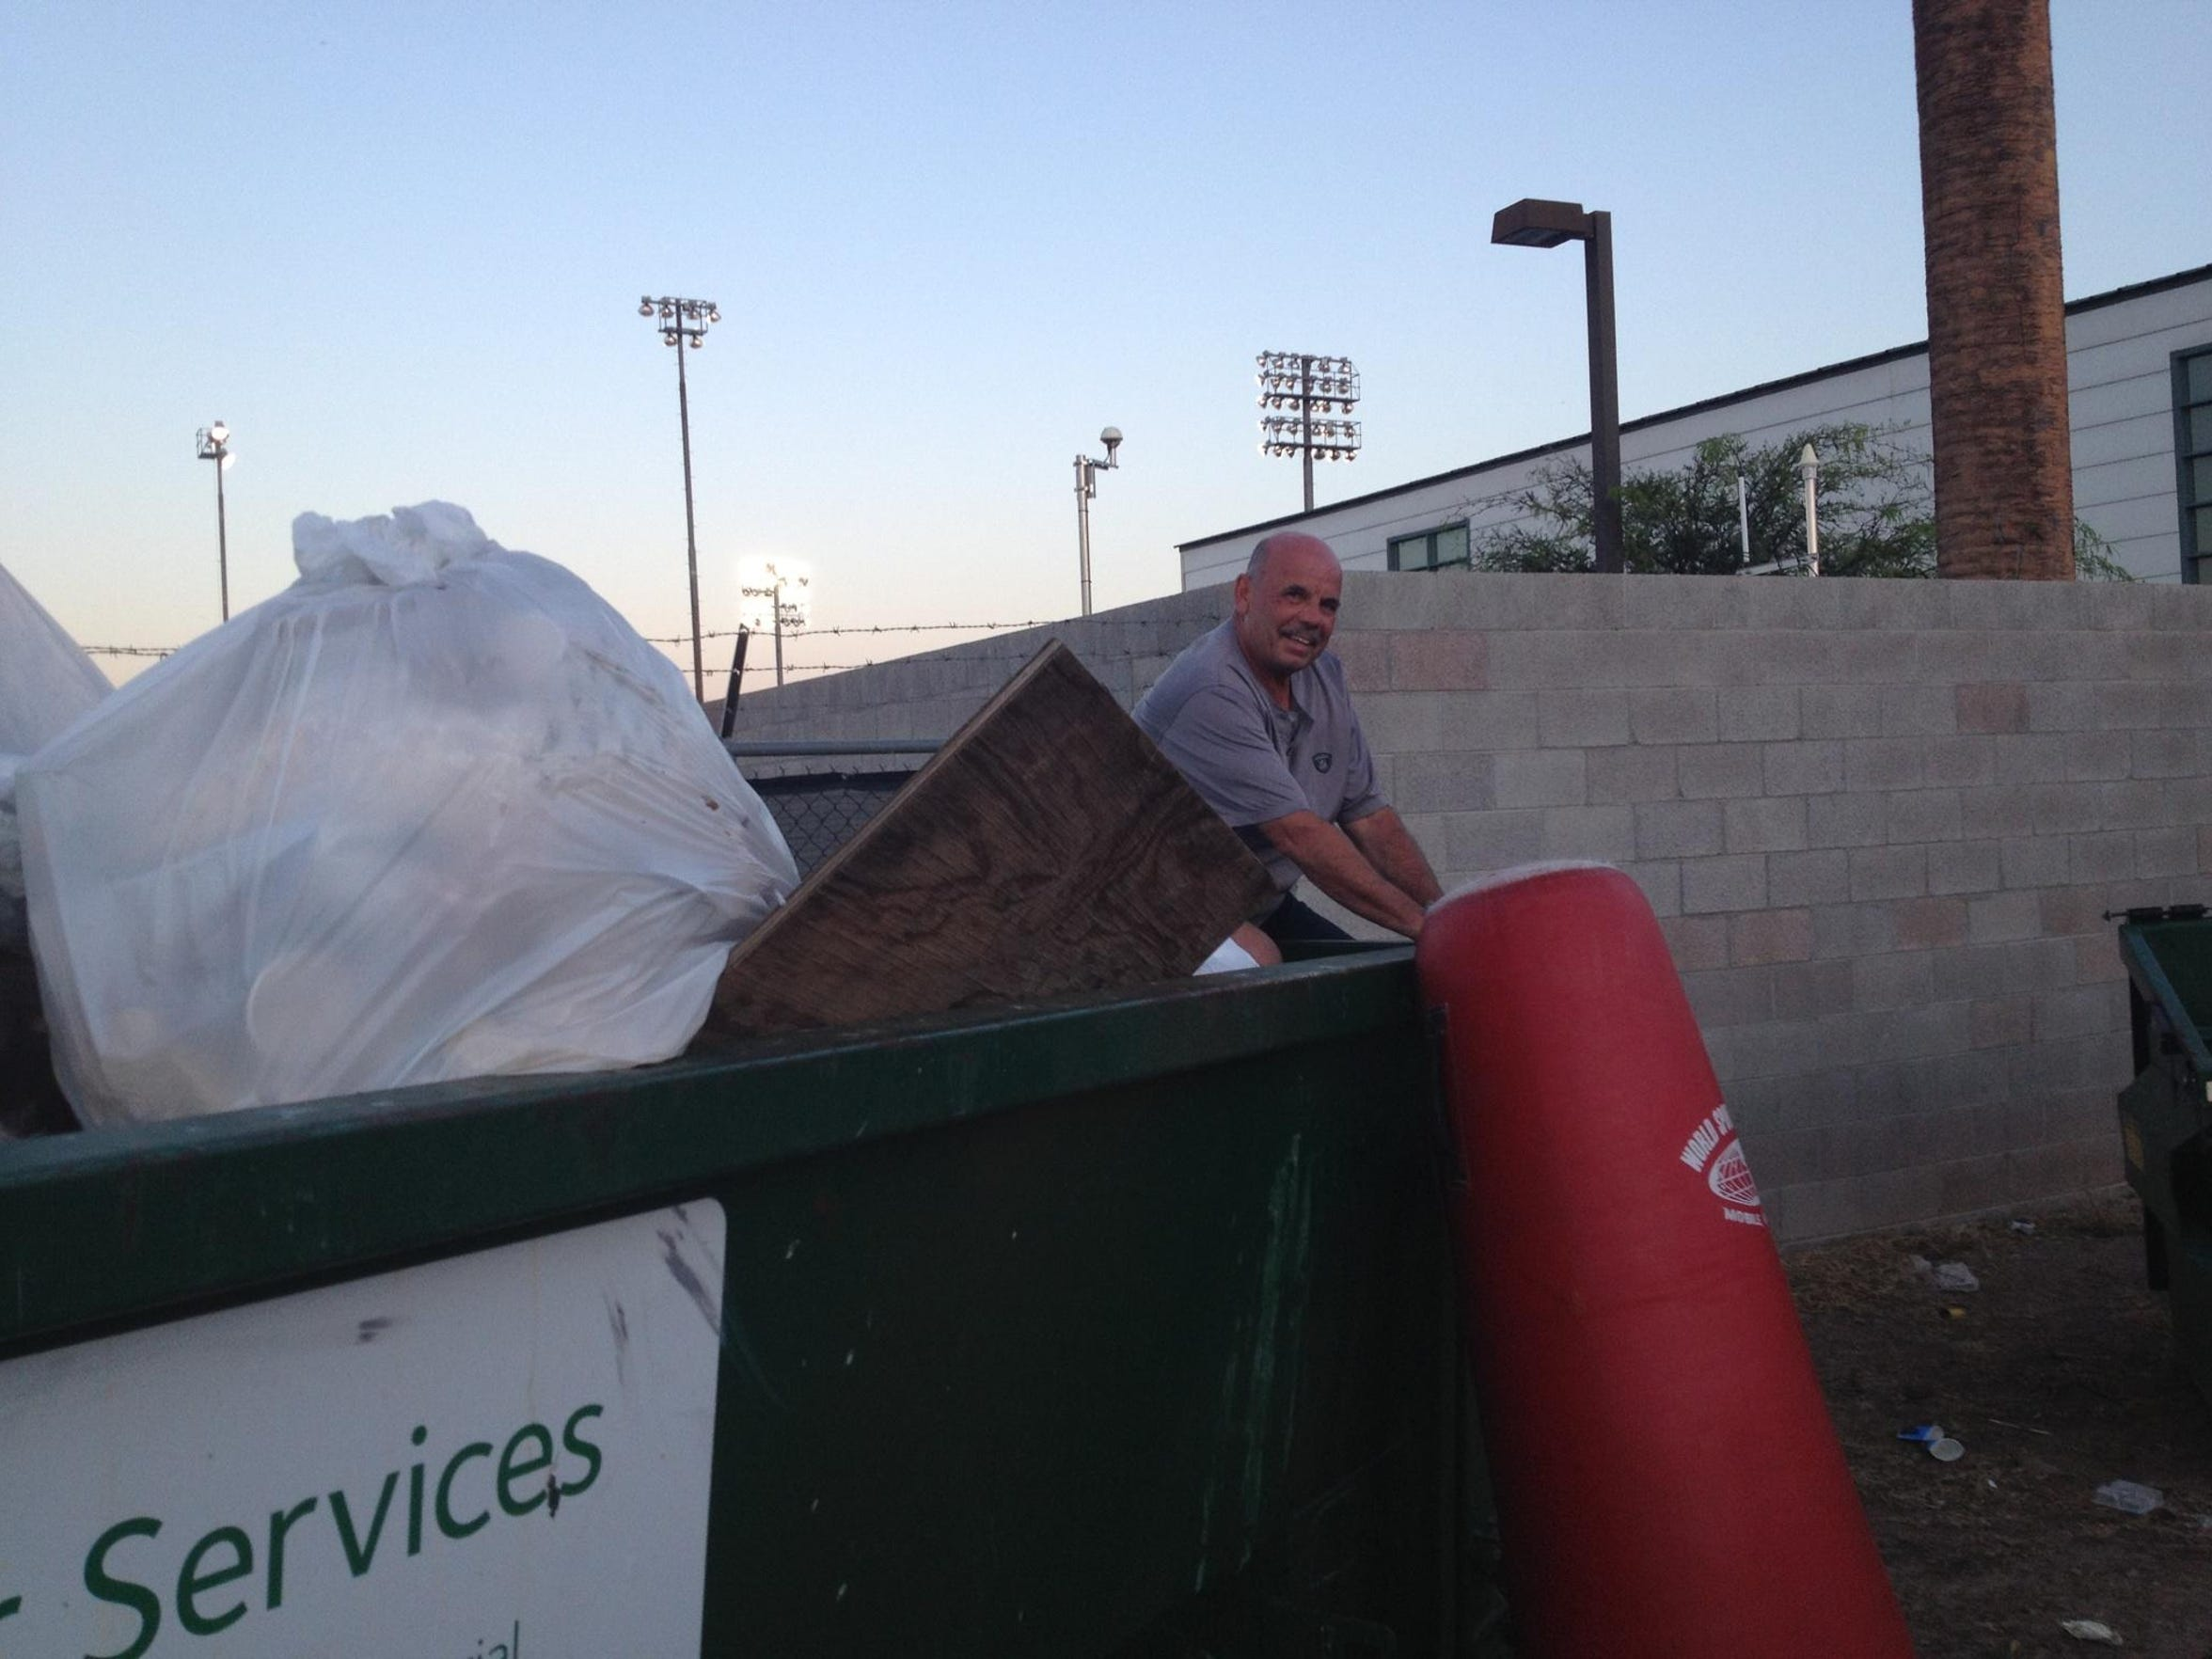 Coach Cozzetto takes equipment for his Phoenix College team at an ASU garbage dump.